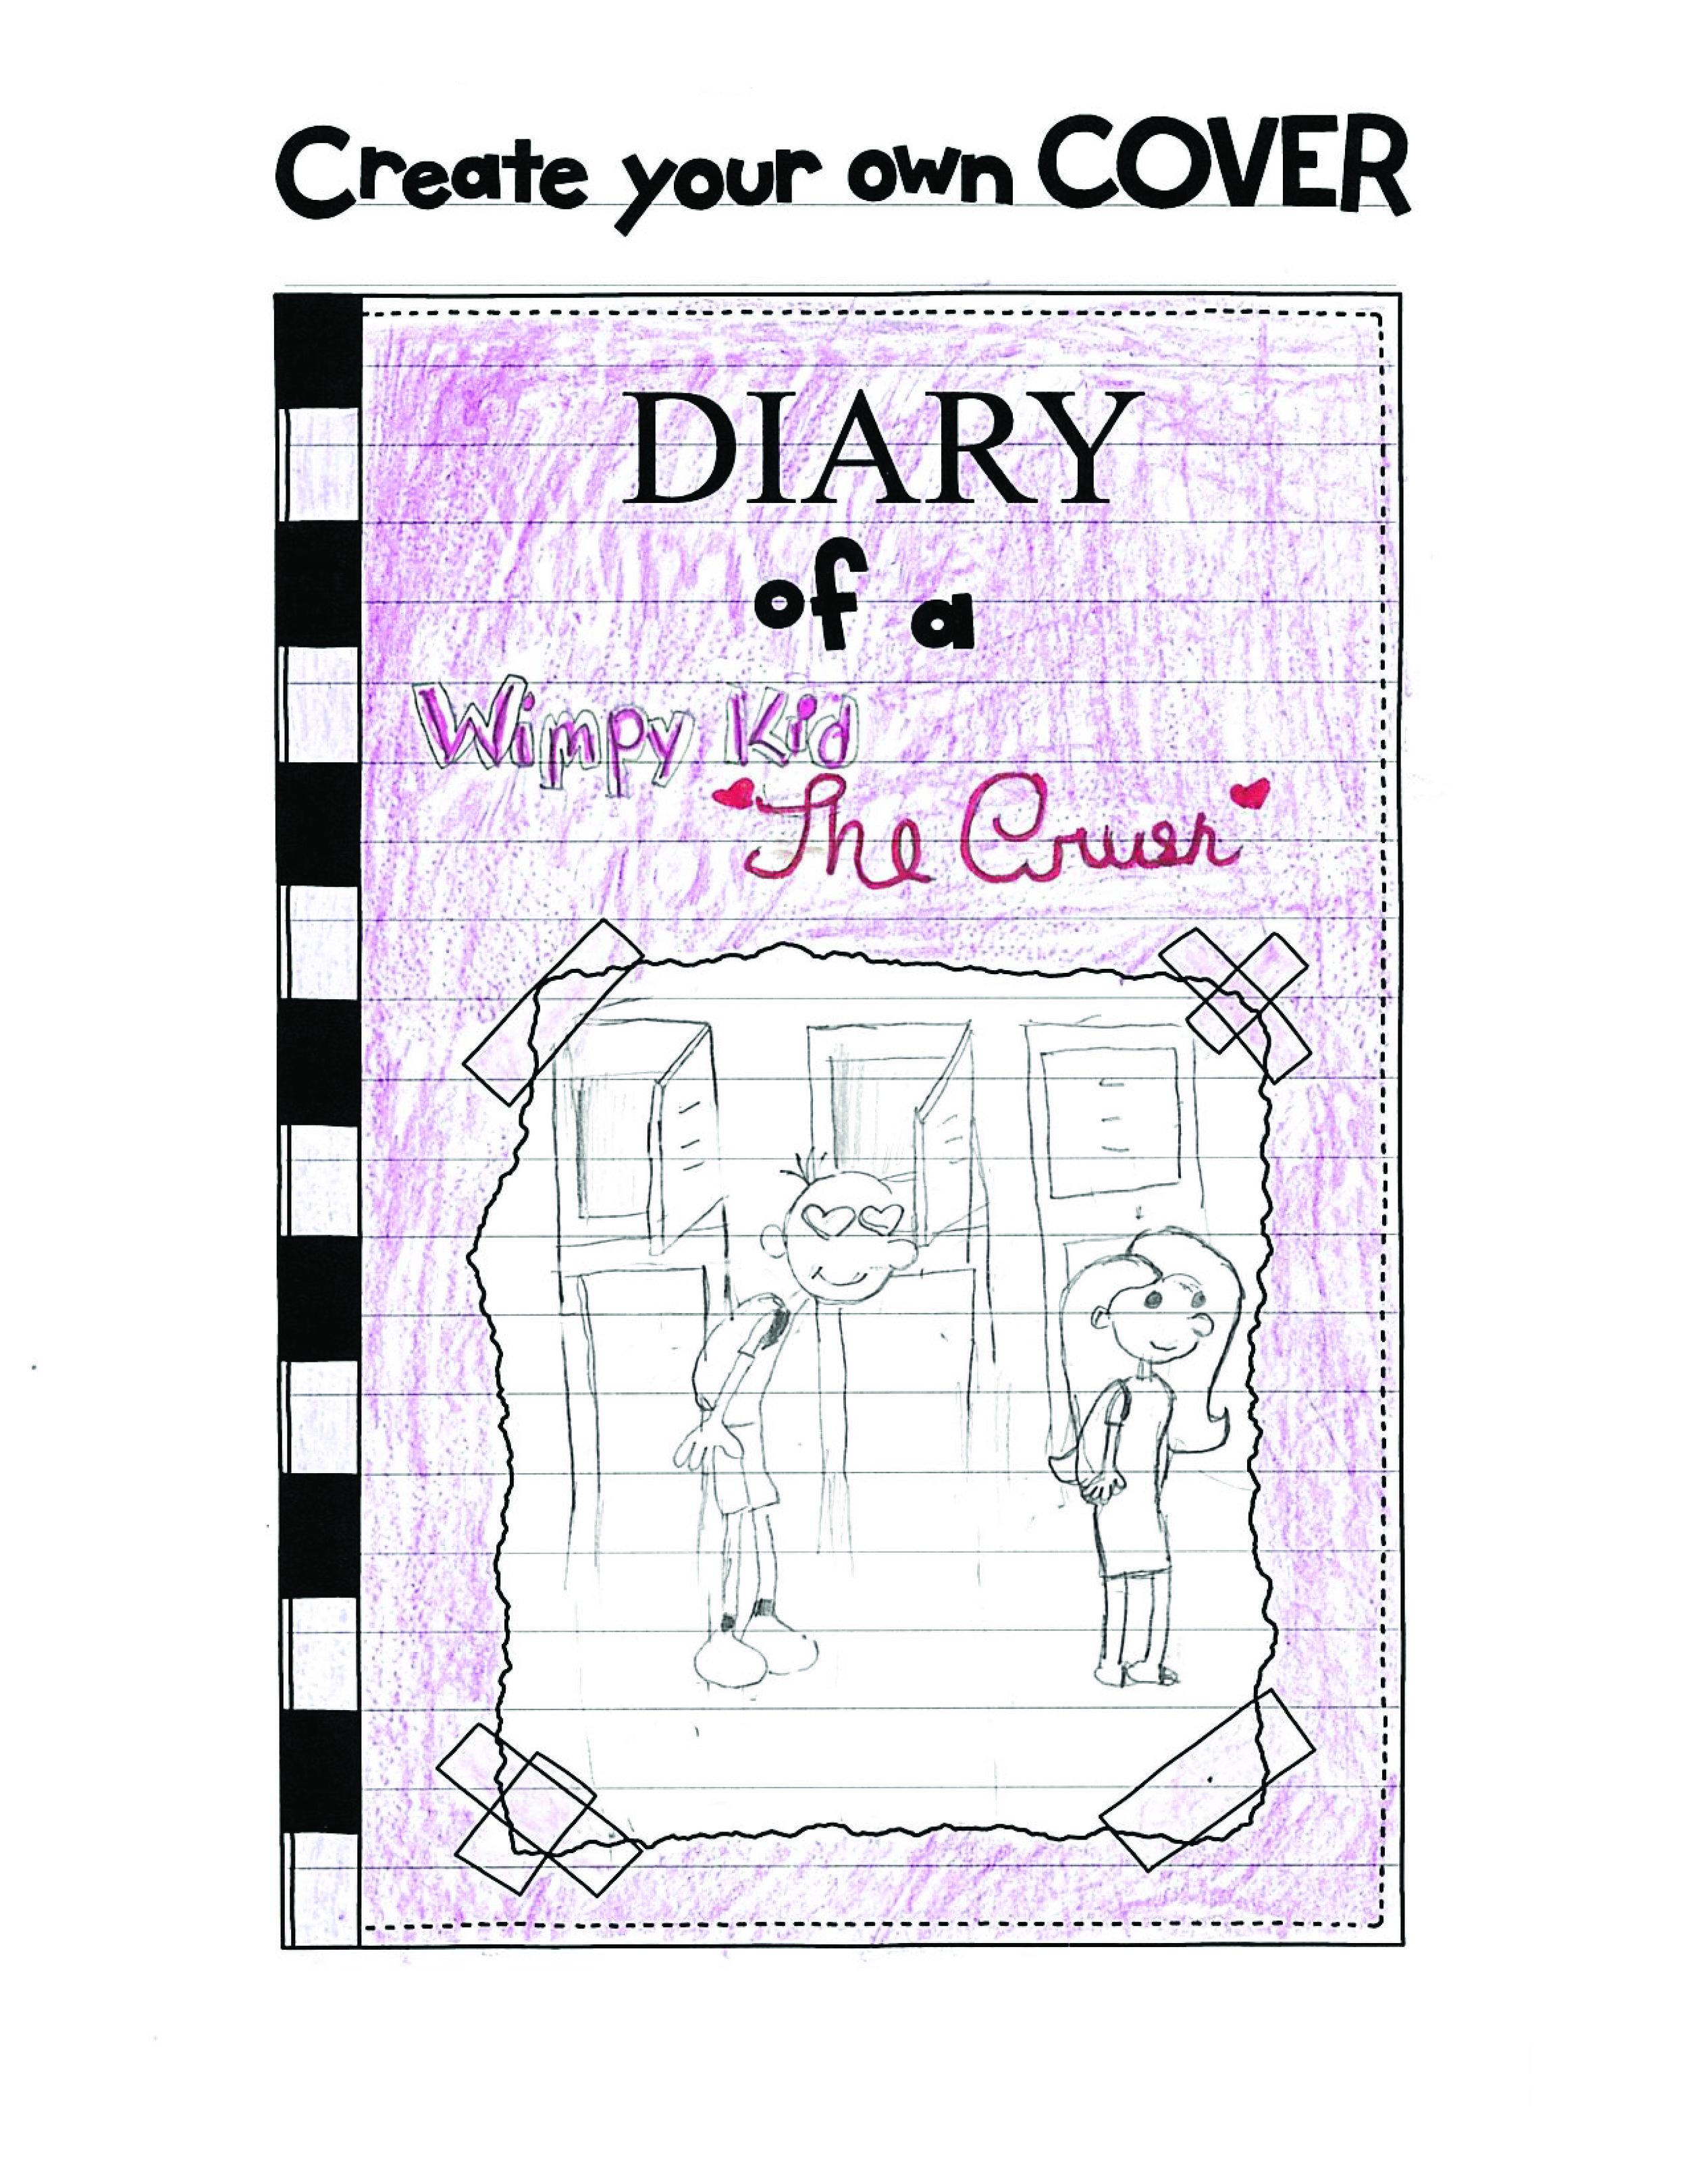 Mishaps And Adventures In Children S Book Design Chad W Beckerman